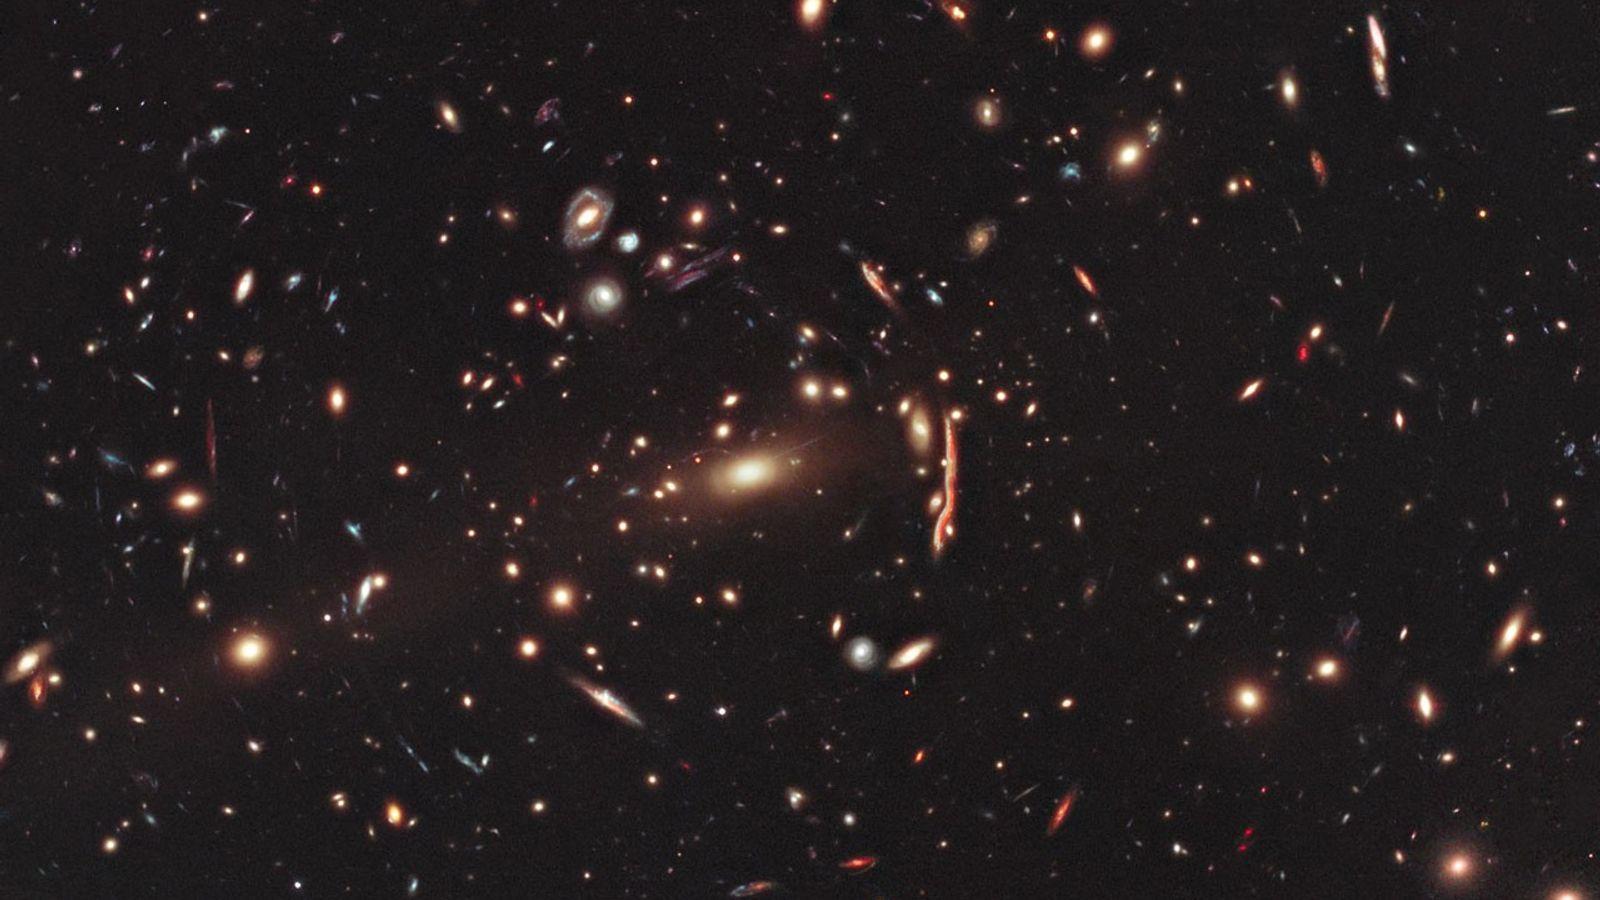 Esta imagem do telescópio espacial Hubble da NASA/ESA mostra o aglomerado de galáxias MACS J1206. Aglomerados ...